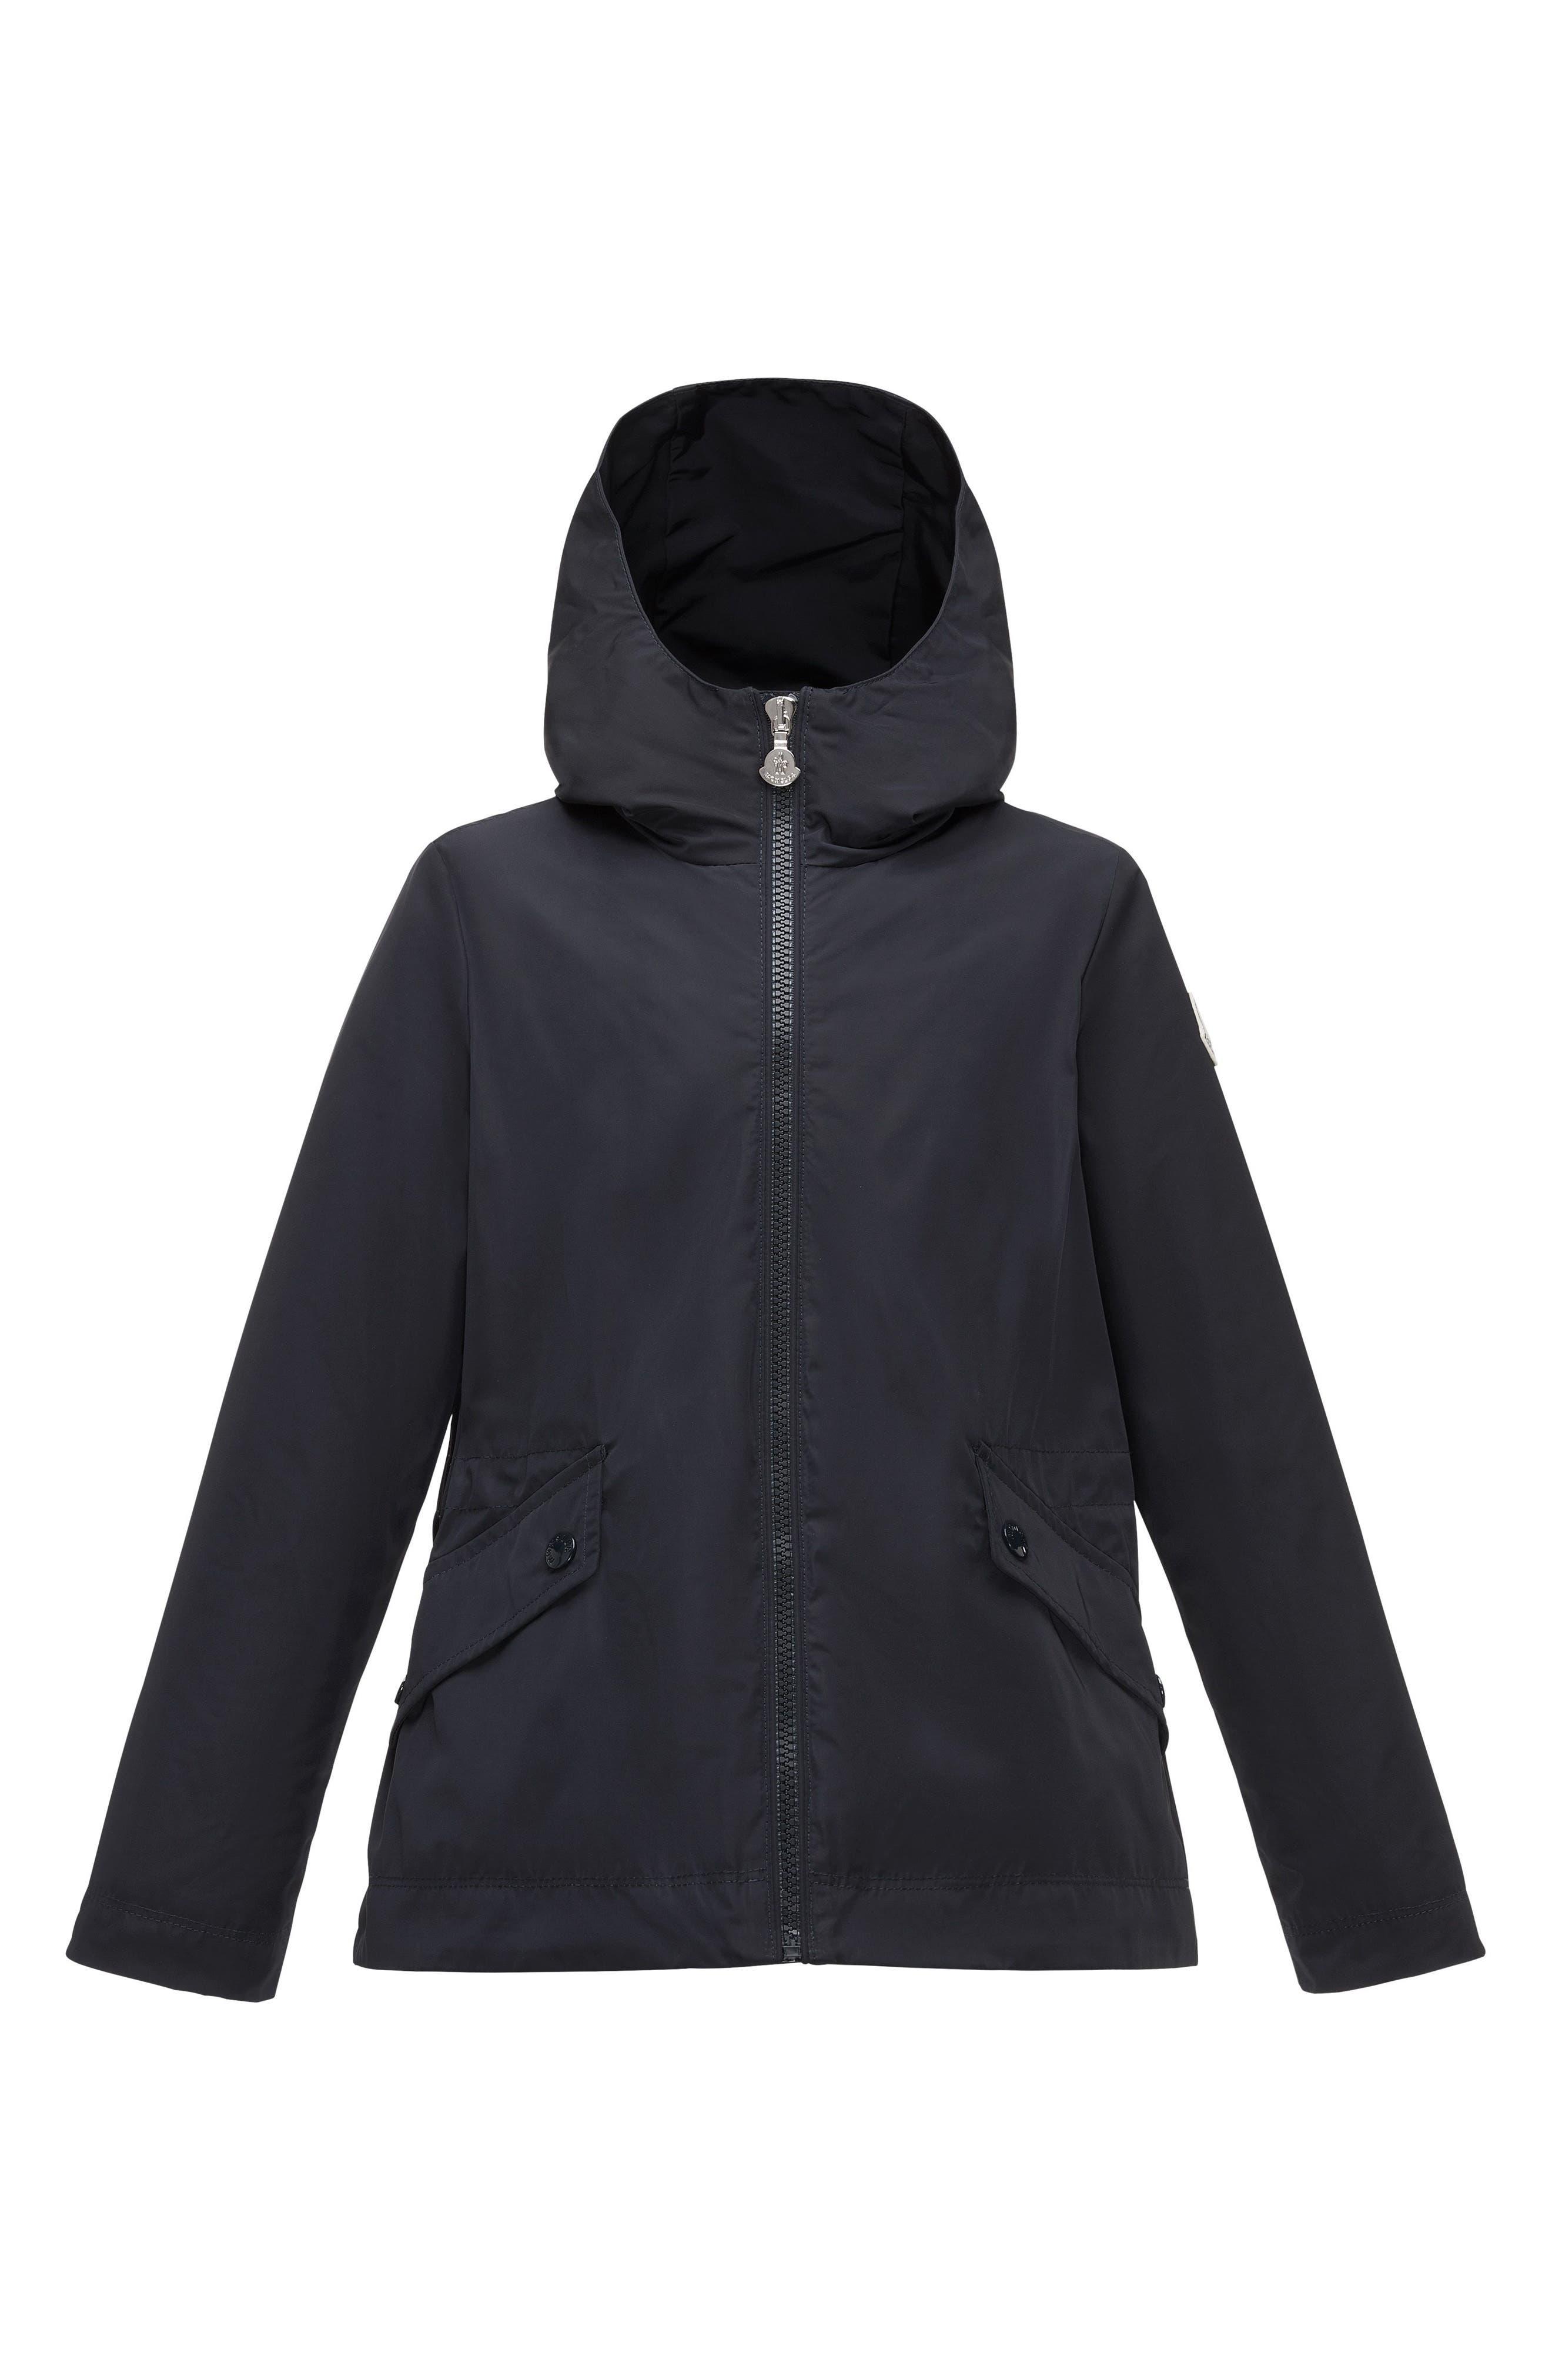 Main Image - Moncler Dericia Hooded Windbreaker Jacket (Little Girls & Big Girls)